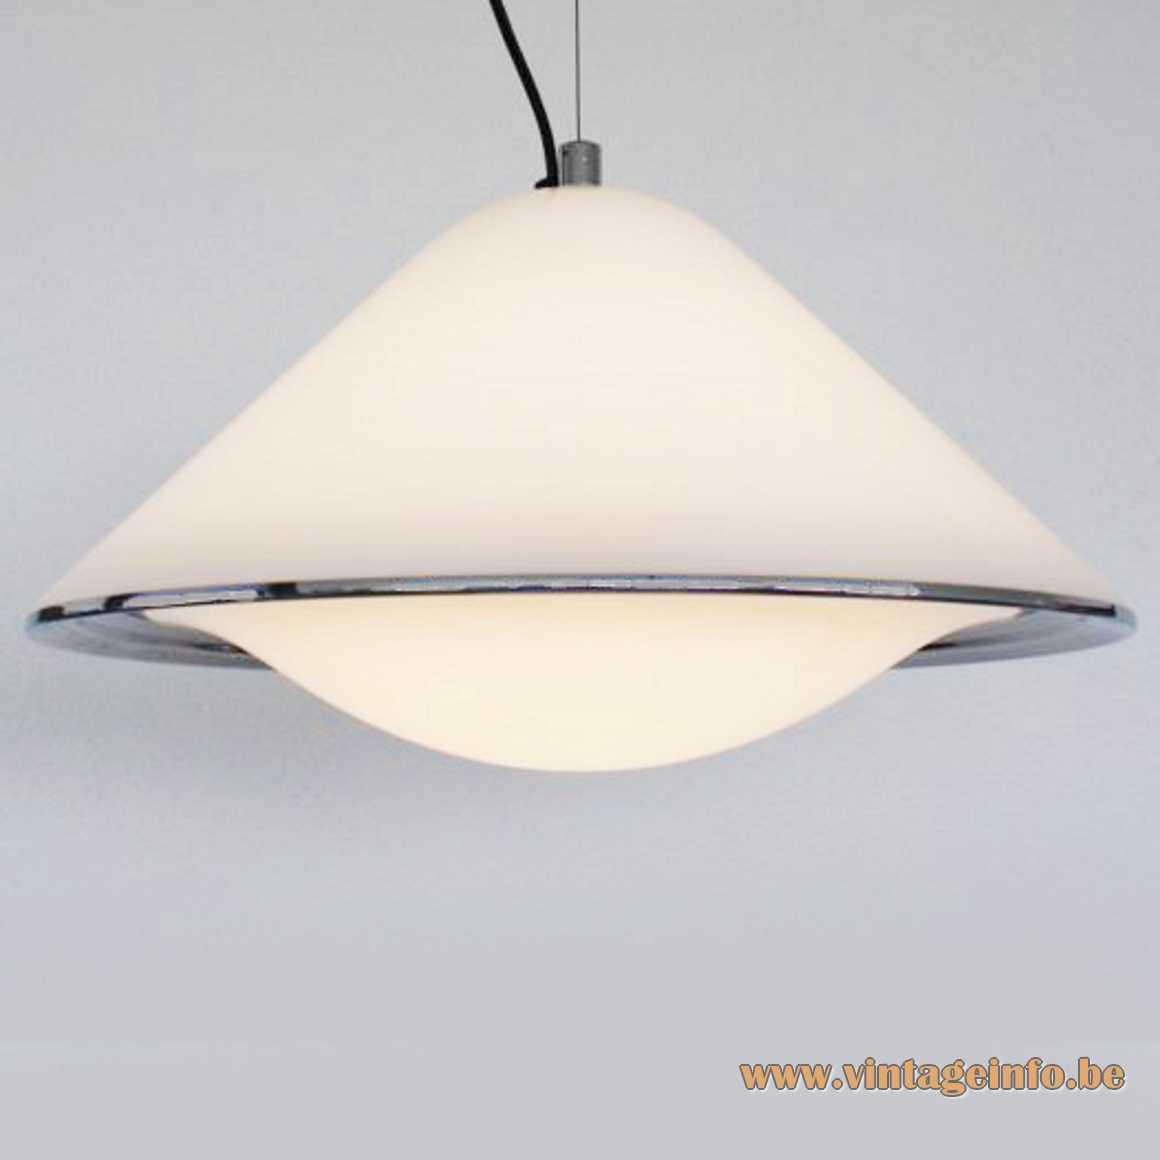 Harvey Guzzini Elpis pendant lamp white conical acrylic mushroom lampshade chrome ring iGuzzini Meblo 1960s 1970s